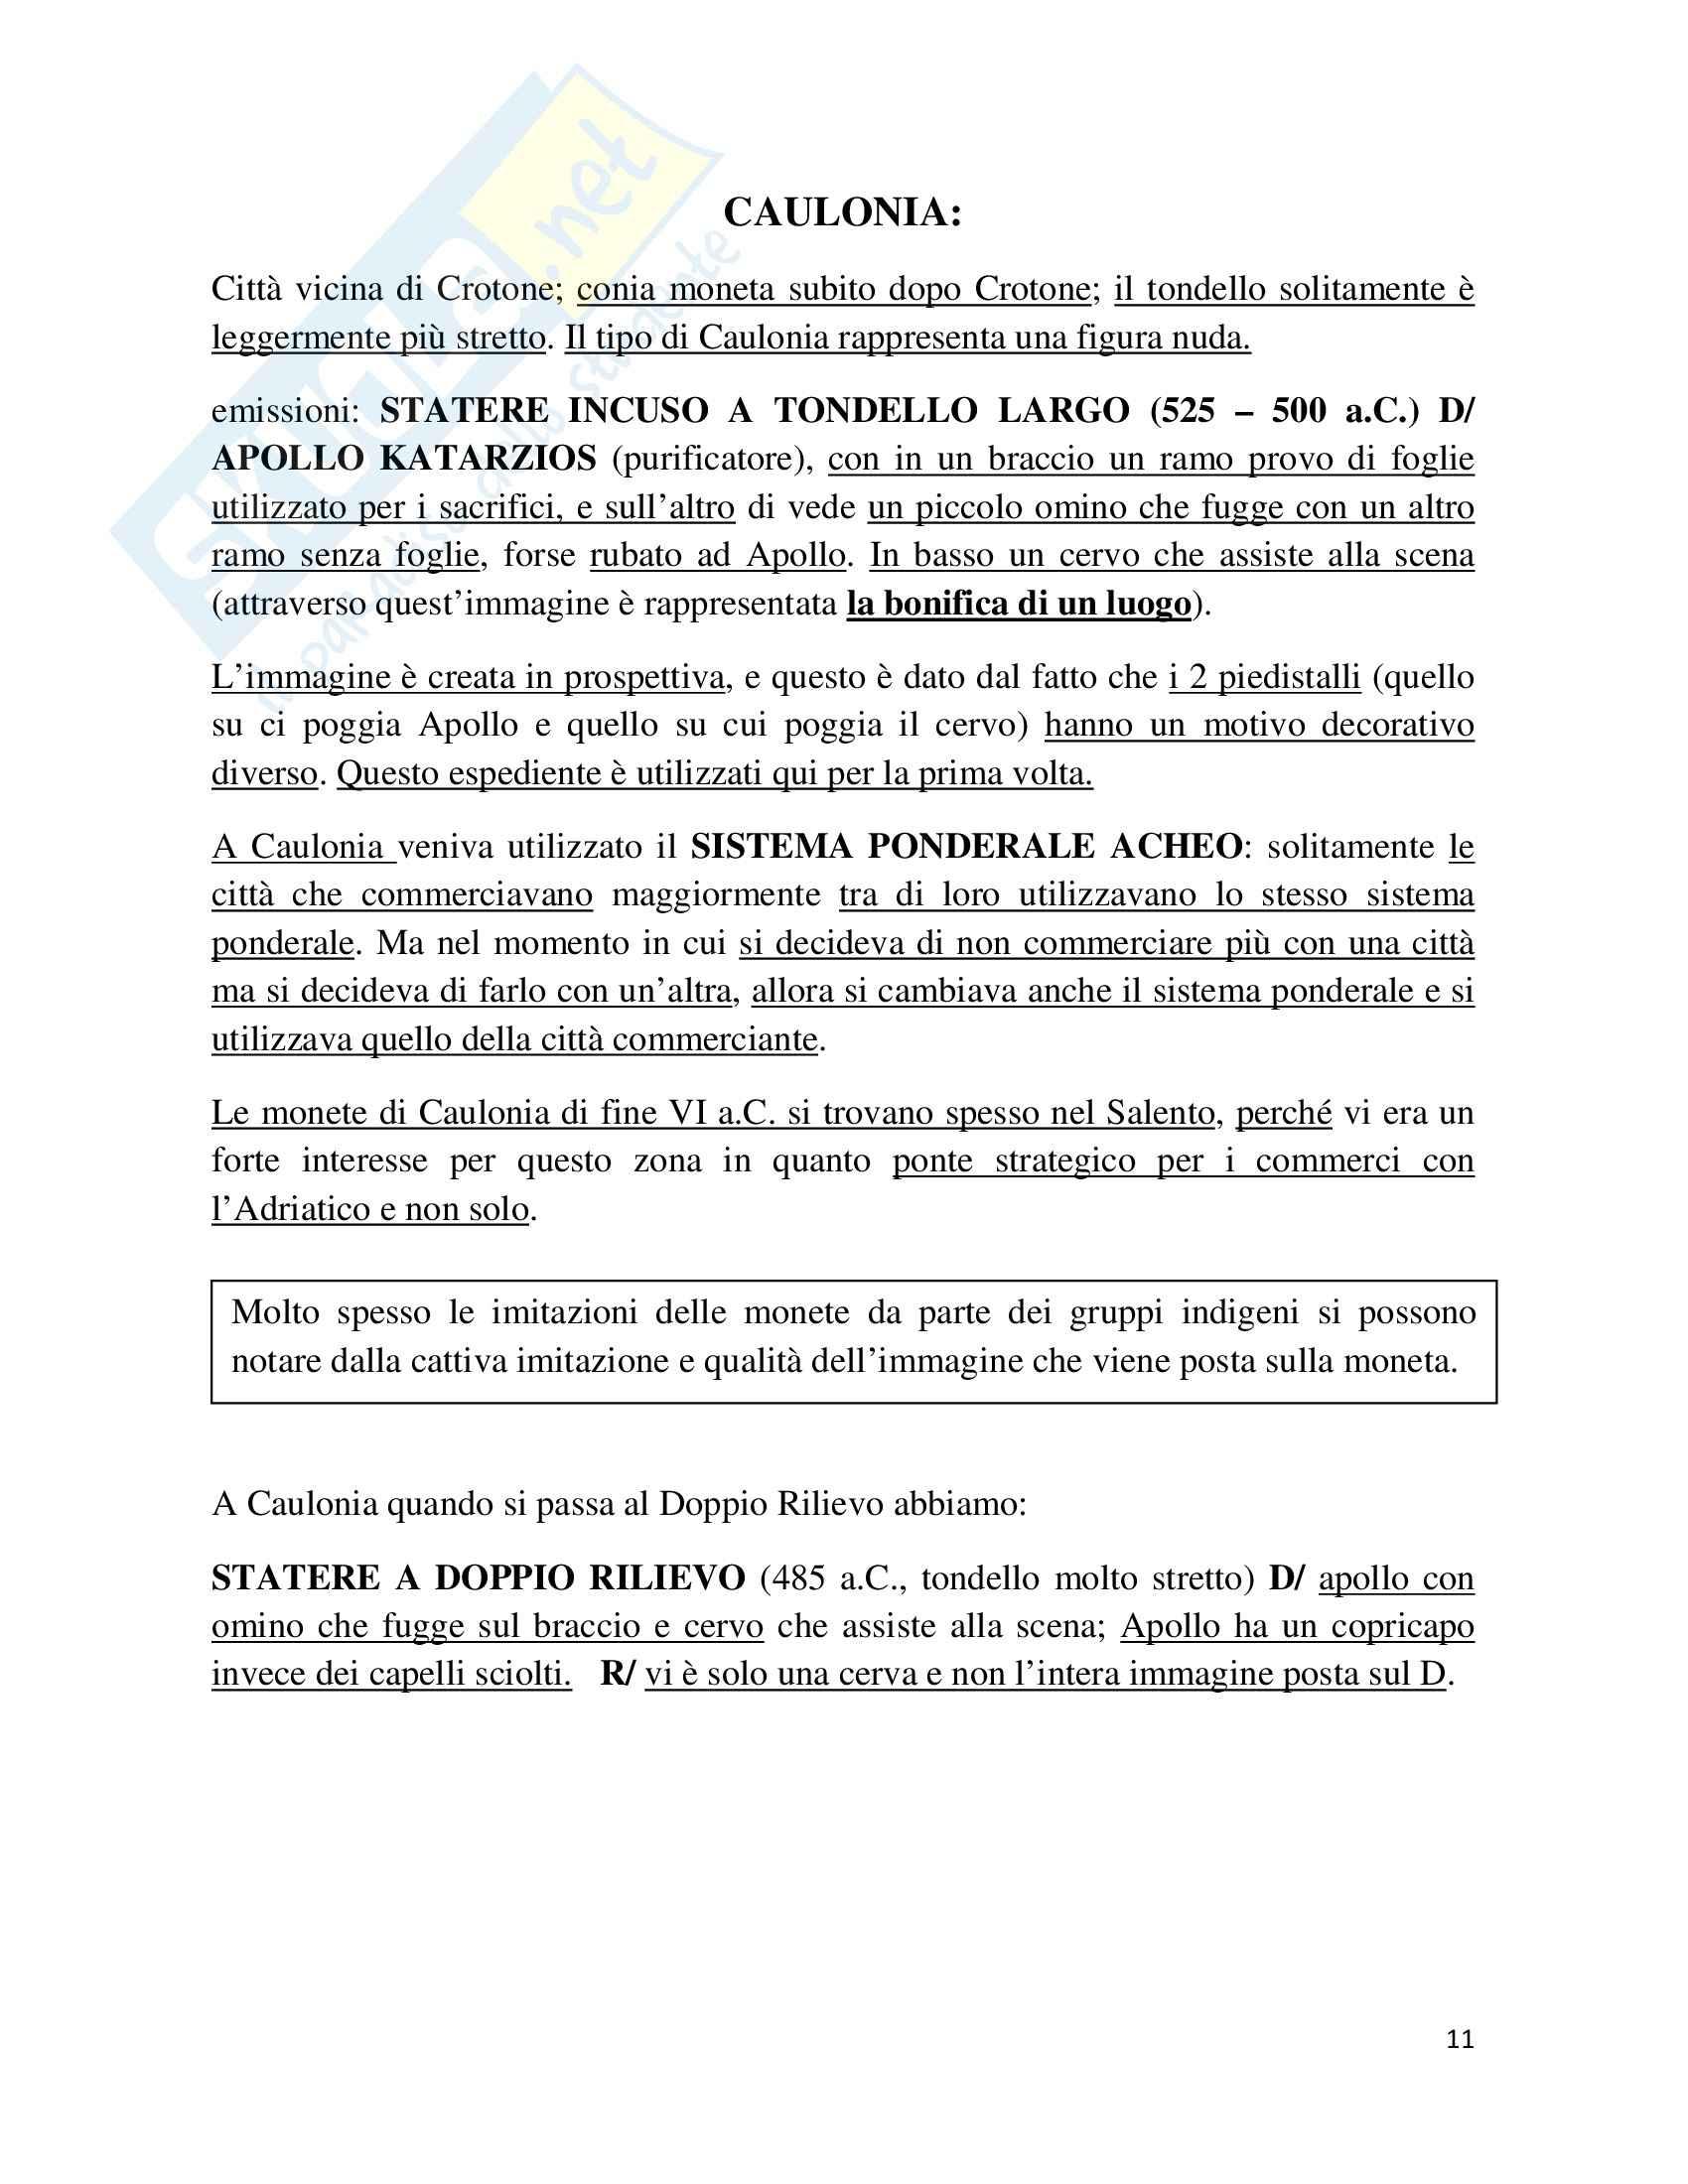 Numismatica antica e medievale - Appunti Pag. 11